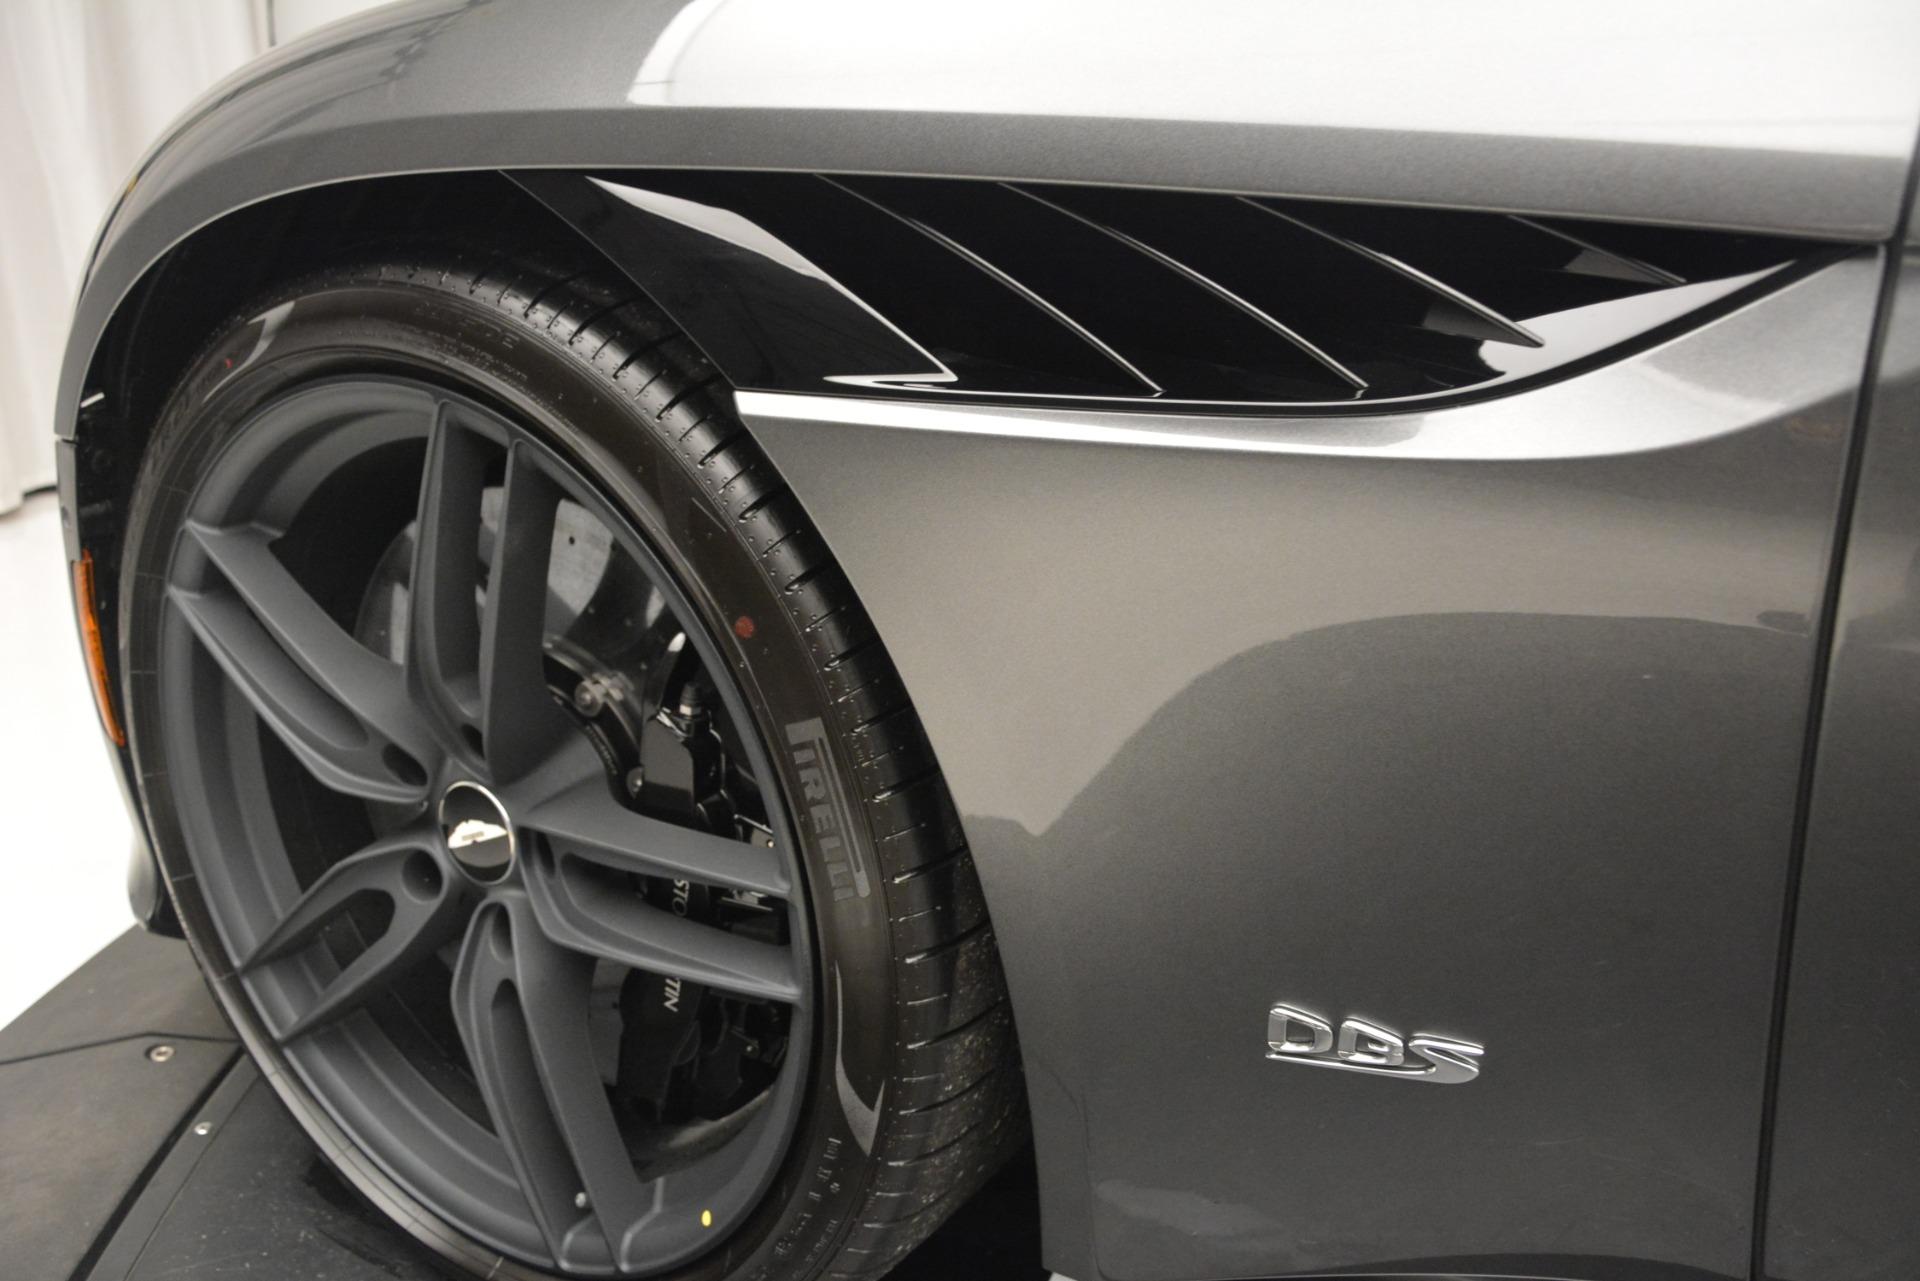 Used 2019 Aston Martin DBS Superleggera For Sale In Greenwich, CT 2917_p13